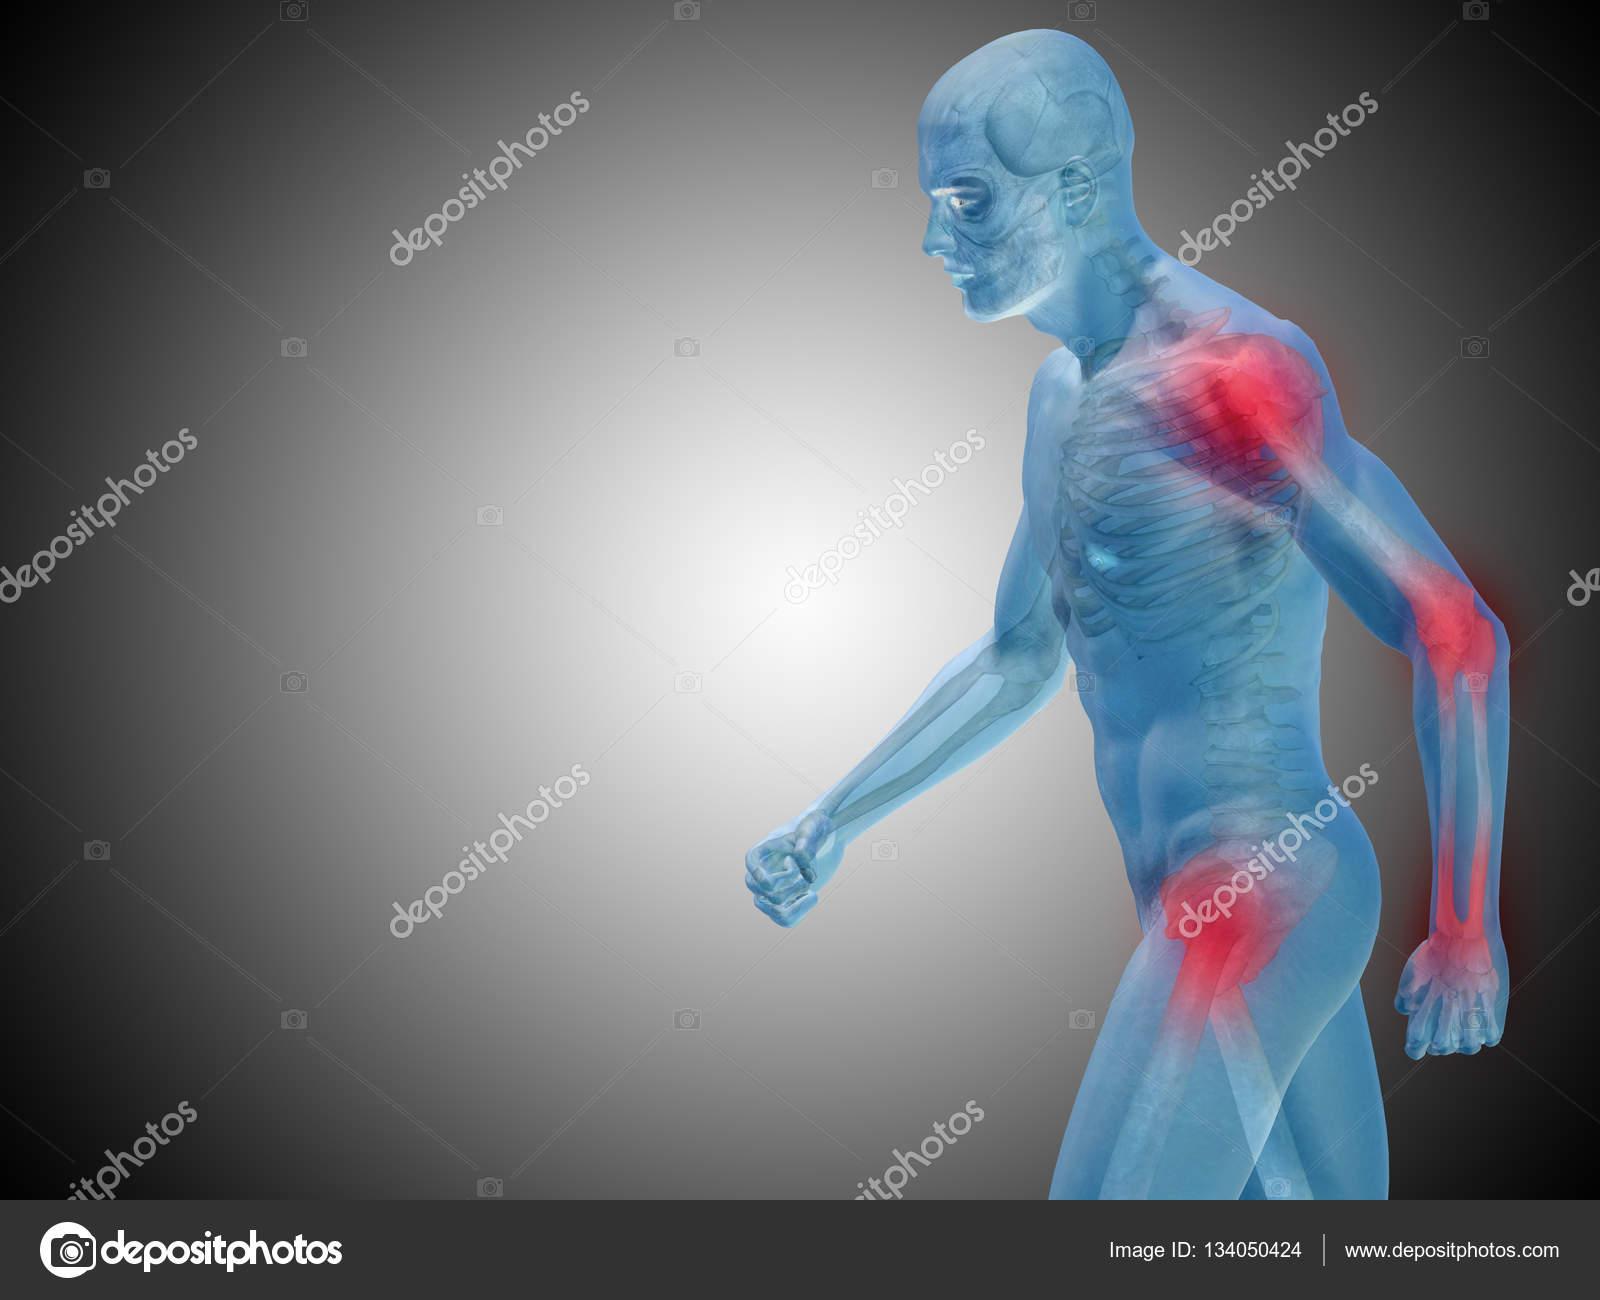 anatomía humana sobre fondo gris — Foto de stock © design36 #134050424